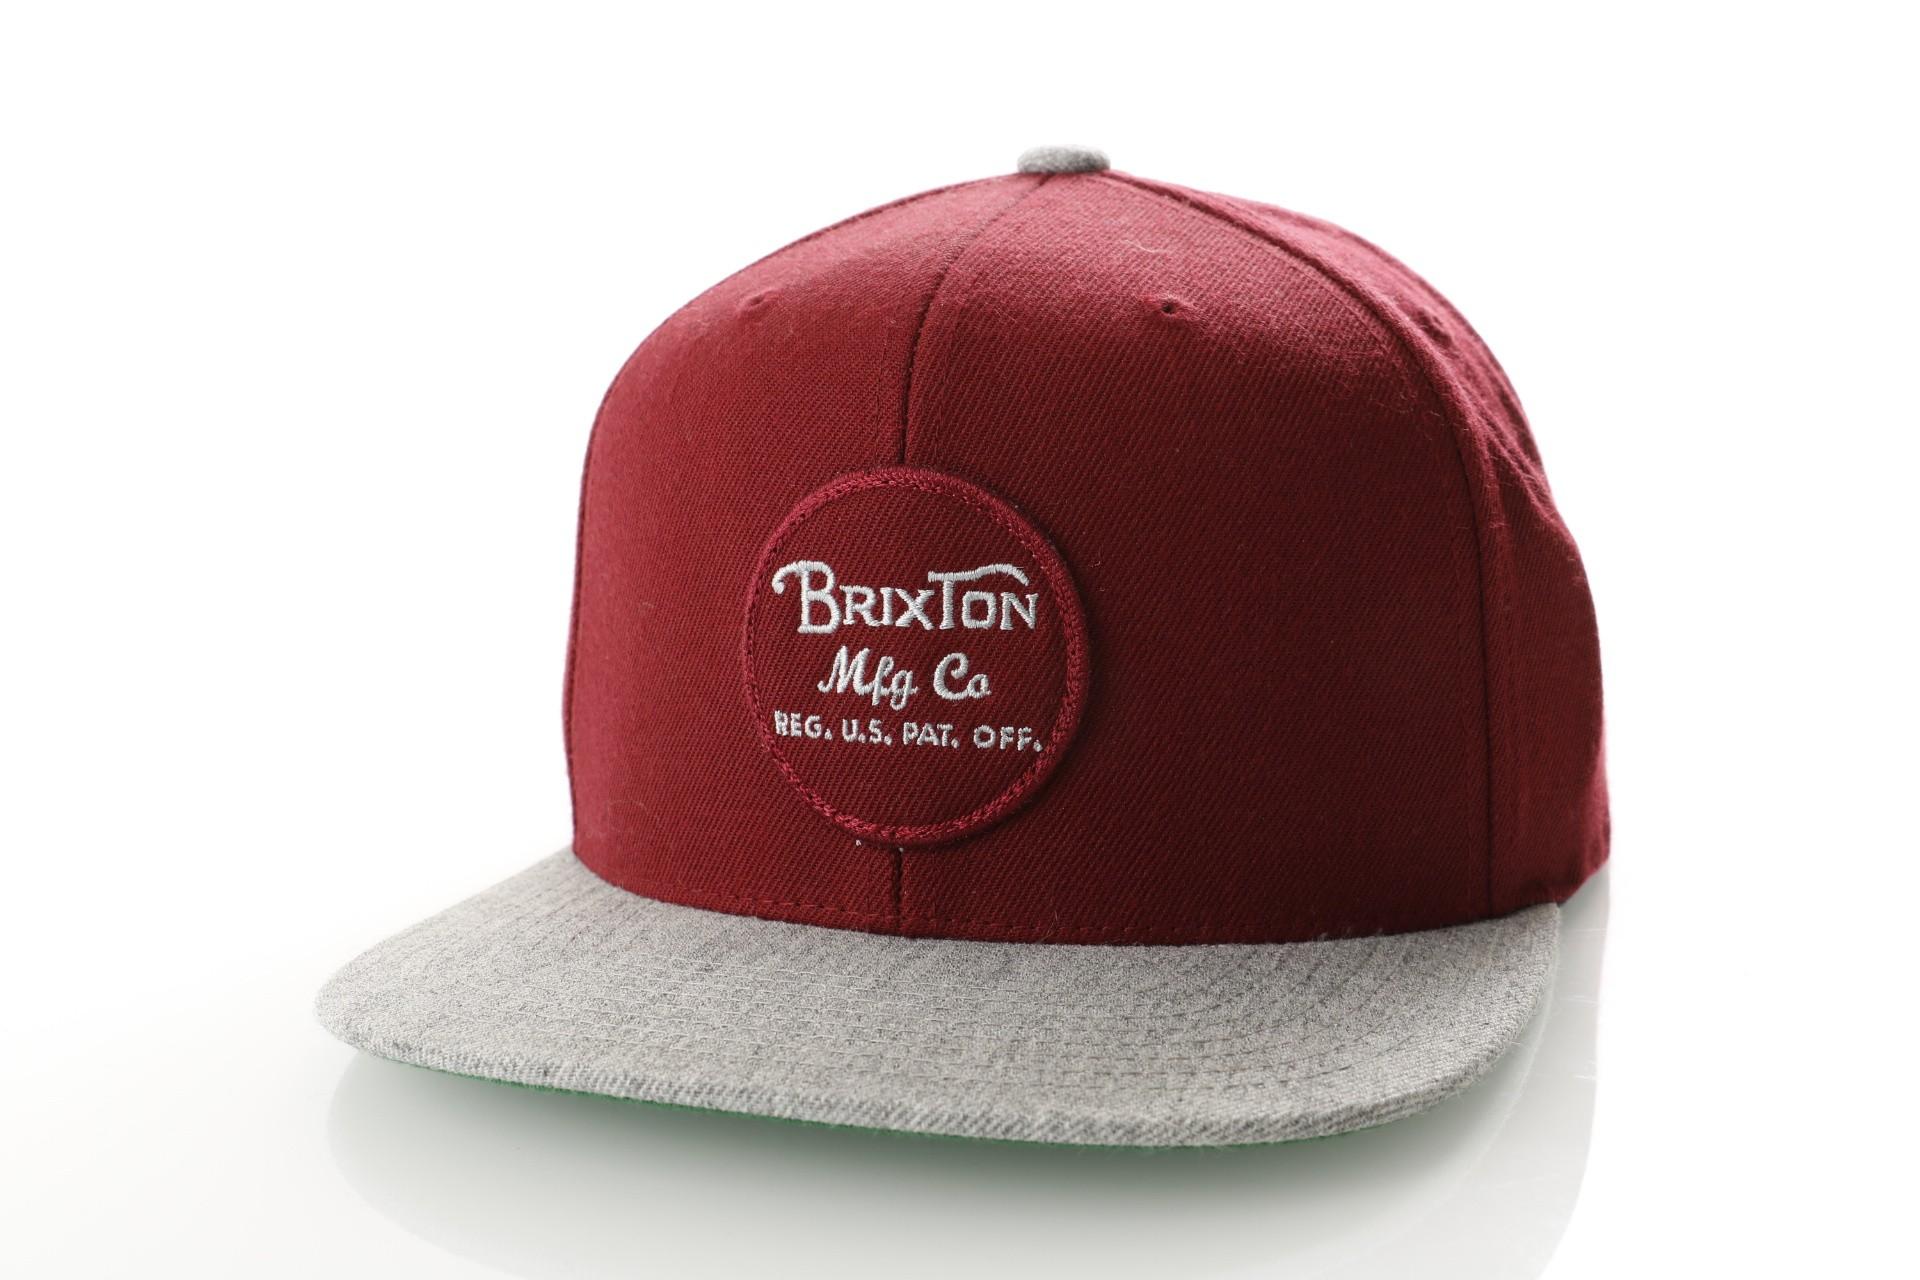 Afbeelding van Brixton WHEELER SNAPBACK 375 snapback cap BURGUNDY/BURGUNDY/HEATHER GREY